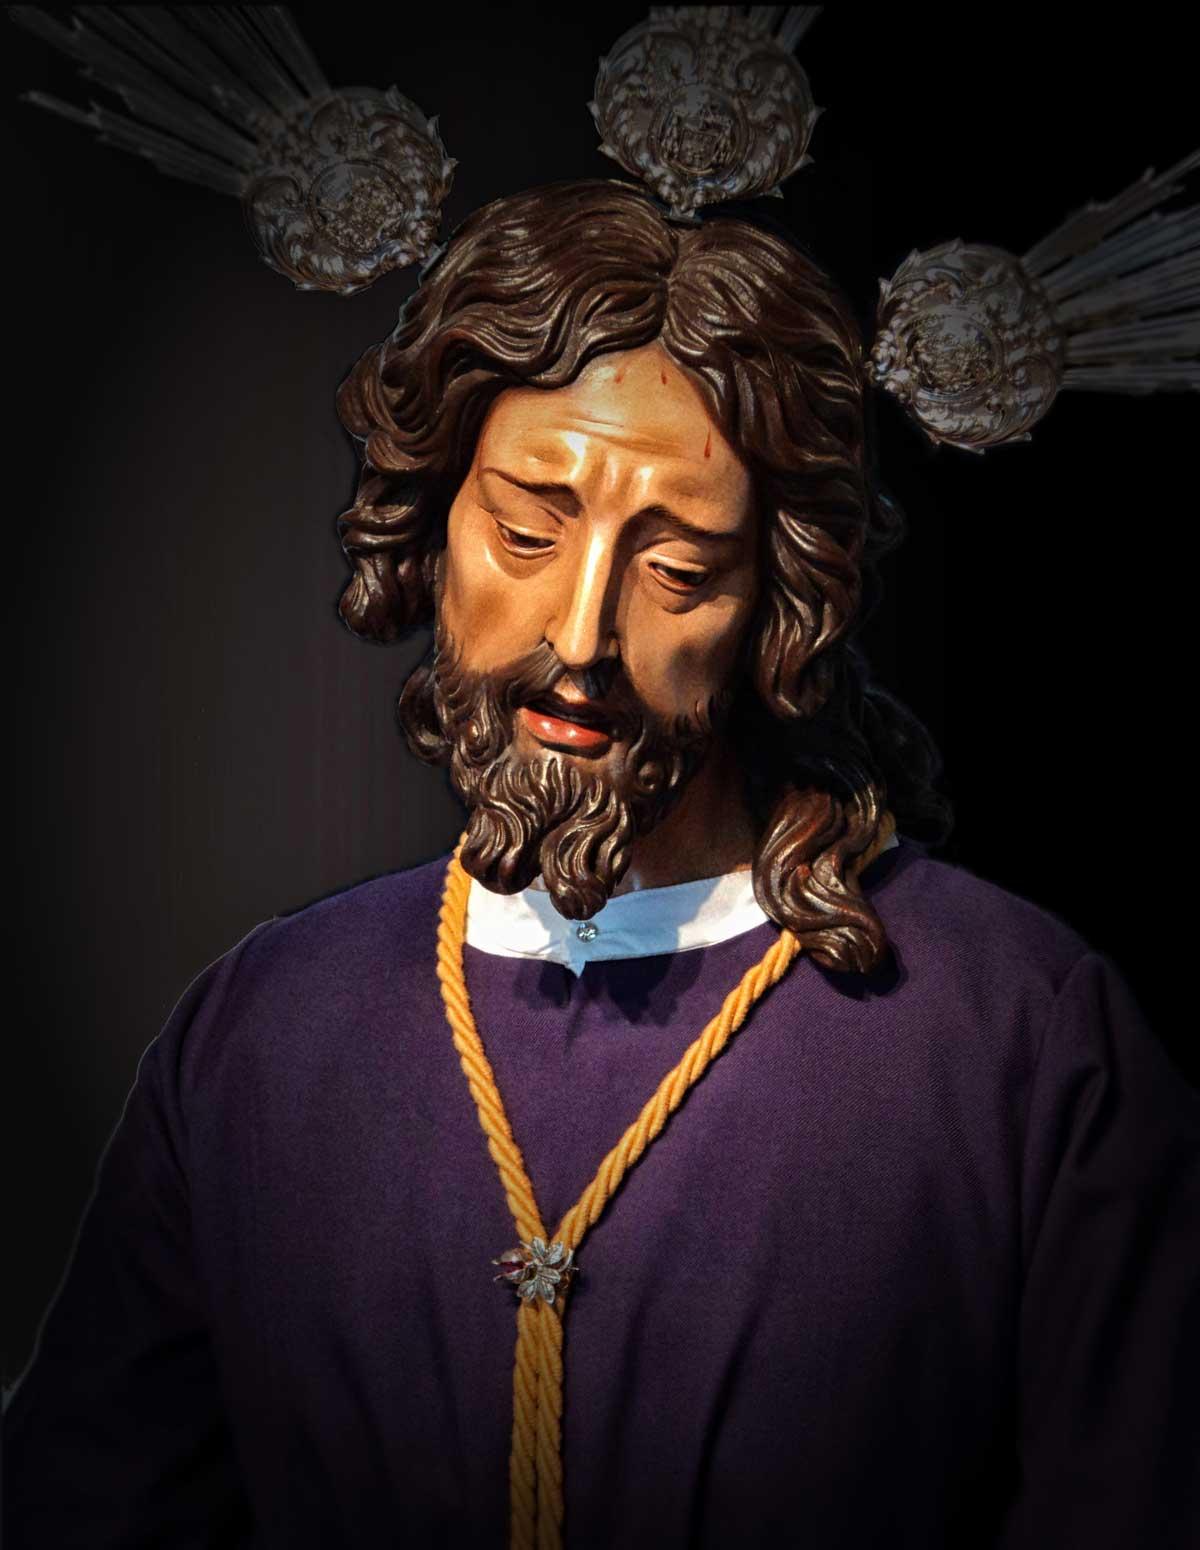 santisimo-cristo-de-la-humildad-y-misericordia-de-bailen-en-jaen-2